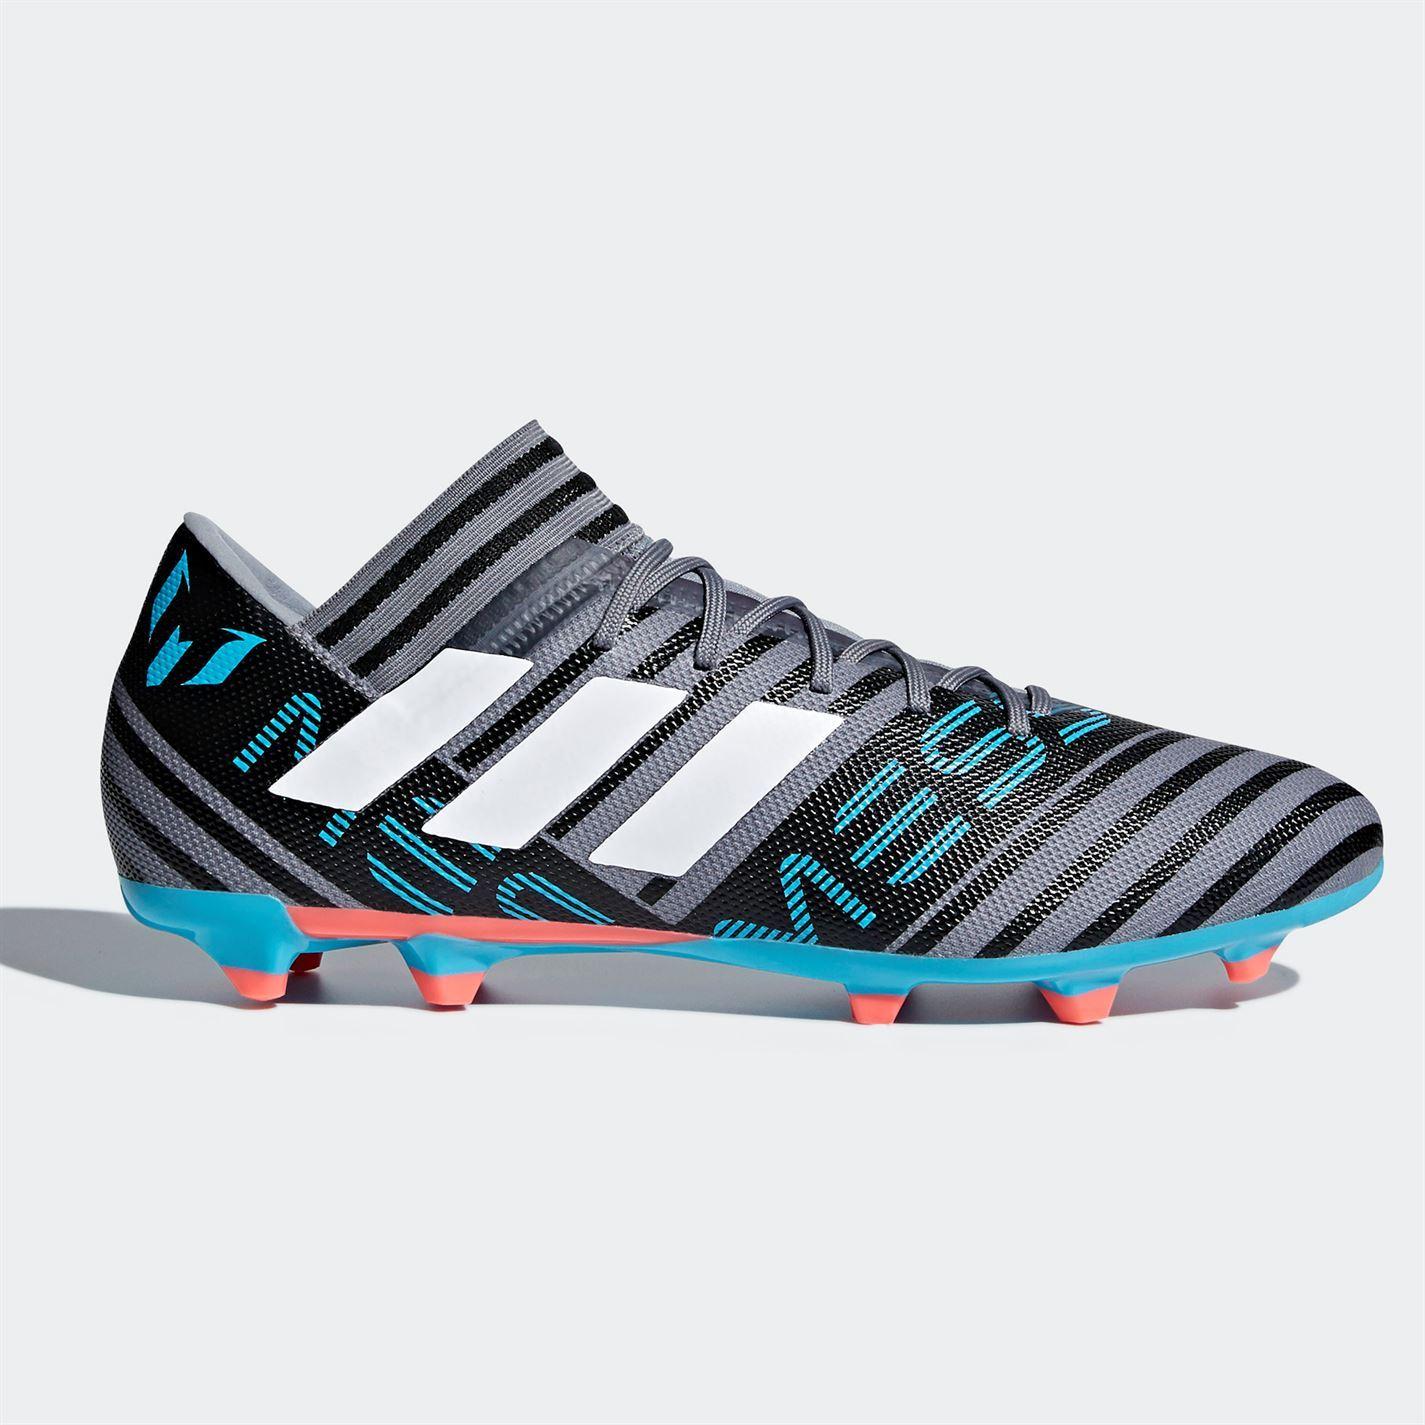 59158b920521ca ... adidas Nemeziz Messi 17.3 Firm Ground Football Boots Mens Grey Soccer  Cleats ...